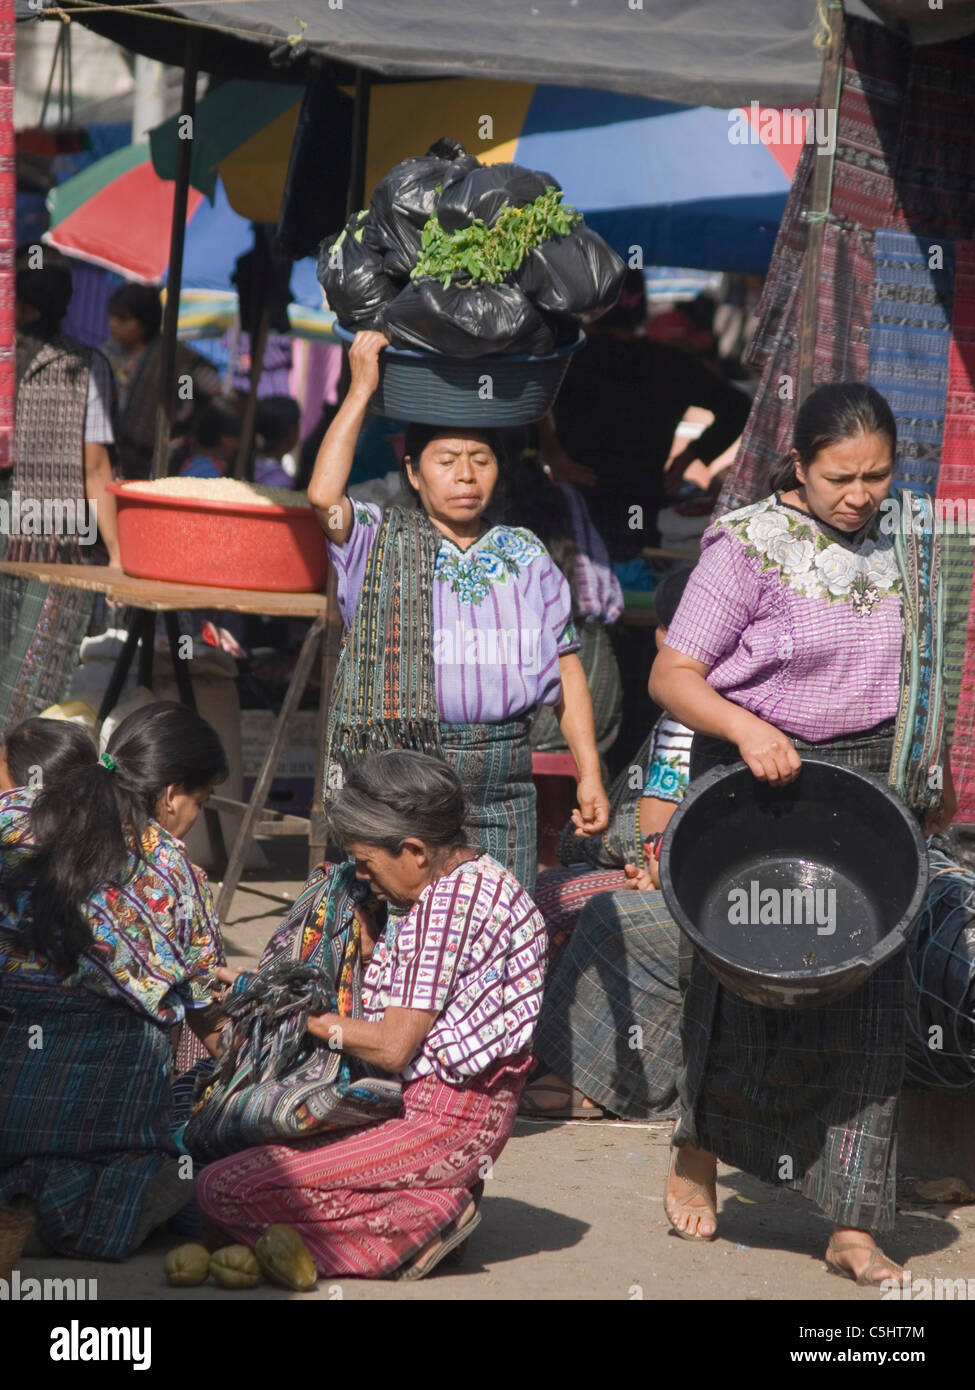 Women in the town market in Santiago Atitlan, Guatemala. - Stock Image